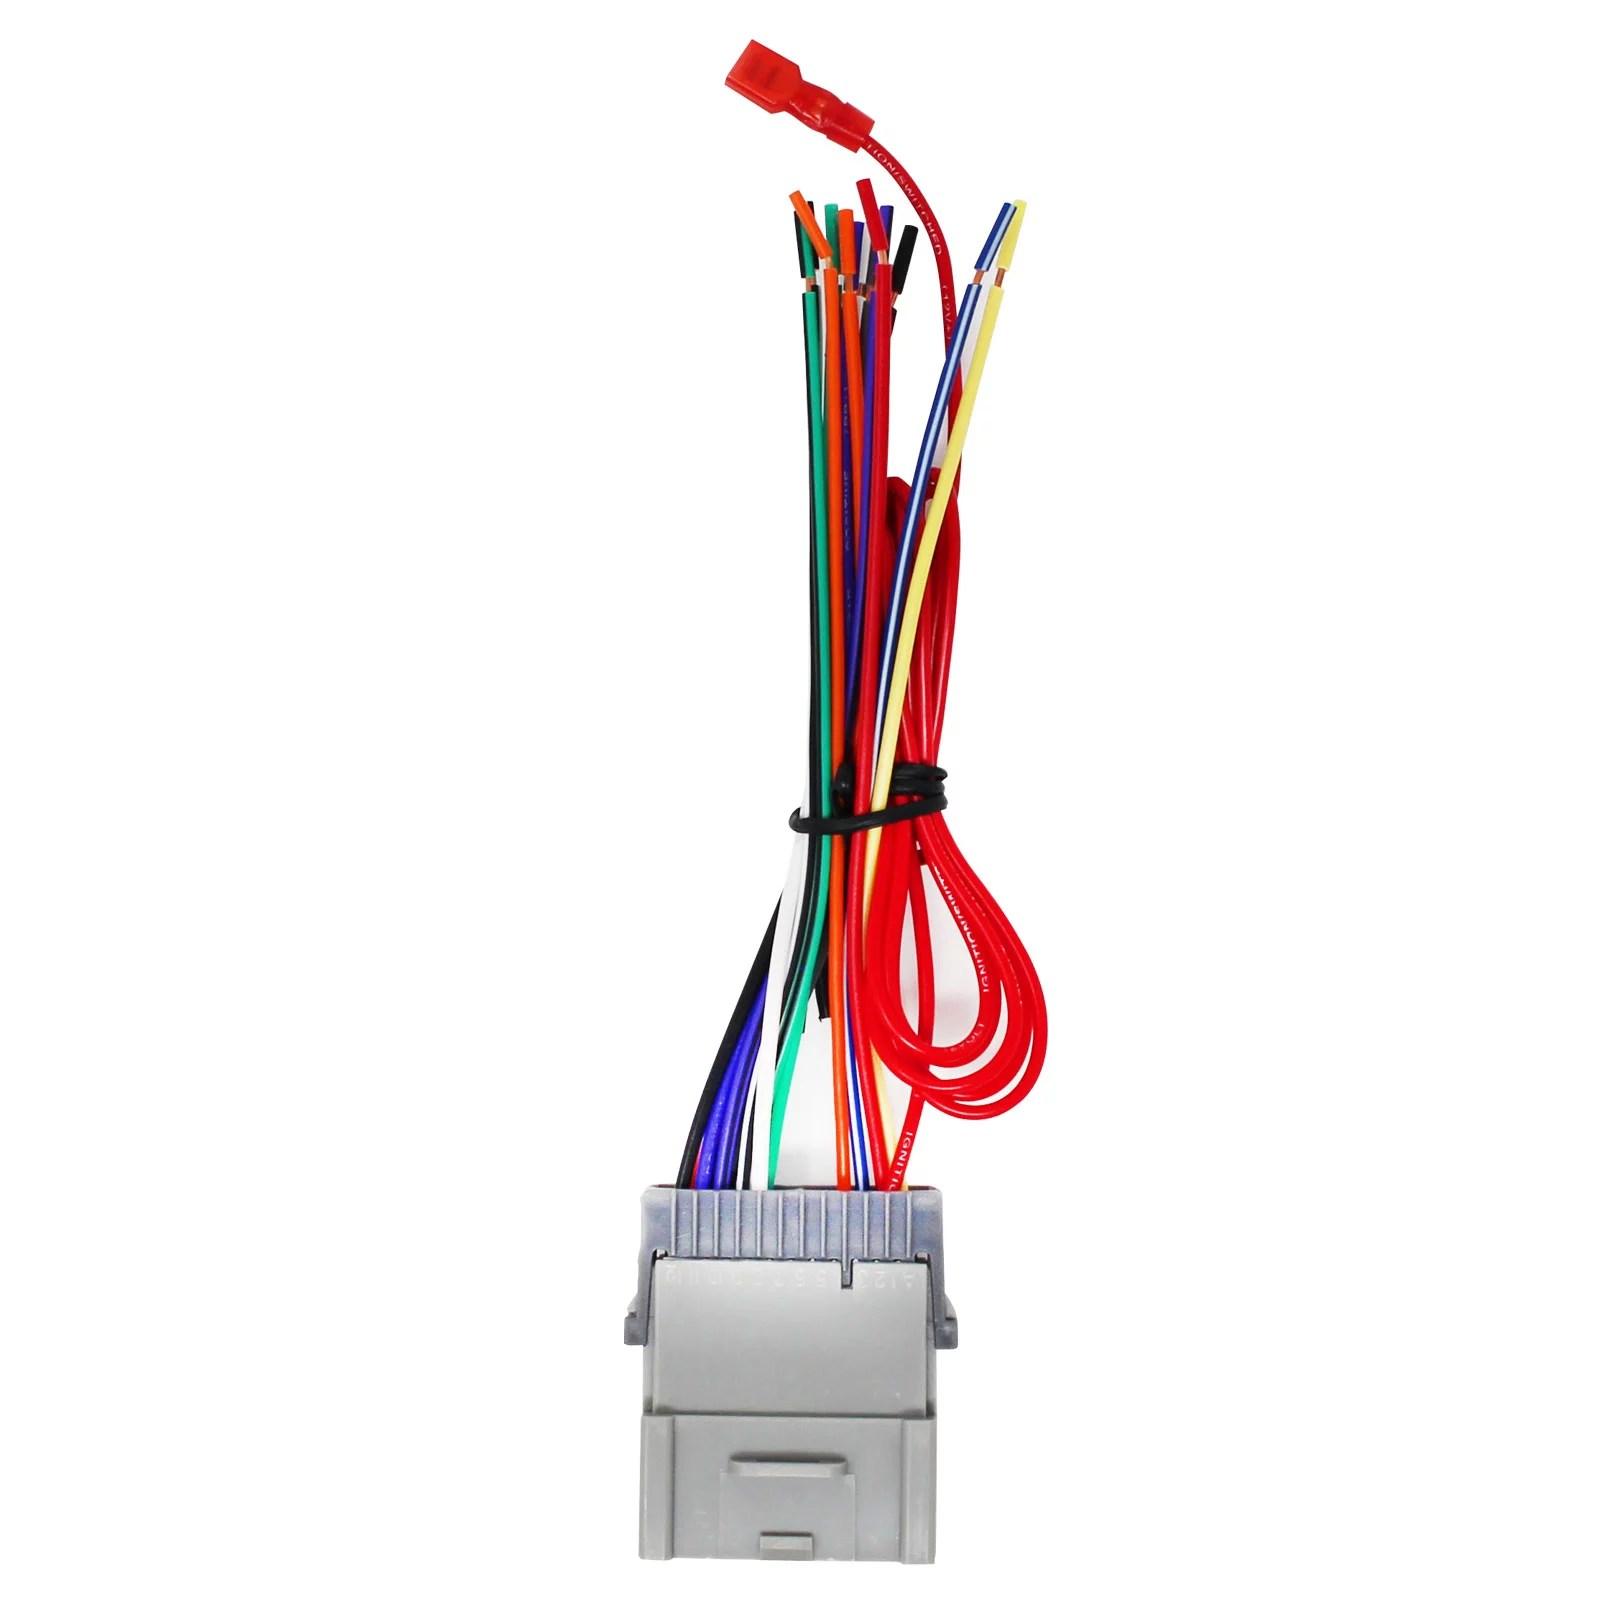 hight resolution of replacement radio wiring harness for 2004 hyundai santa fe 2003 hyundai santa fe 2003 pontiac vibe 2004 pontiac vibe 2004 chevrolet tracker